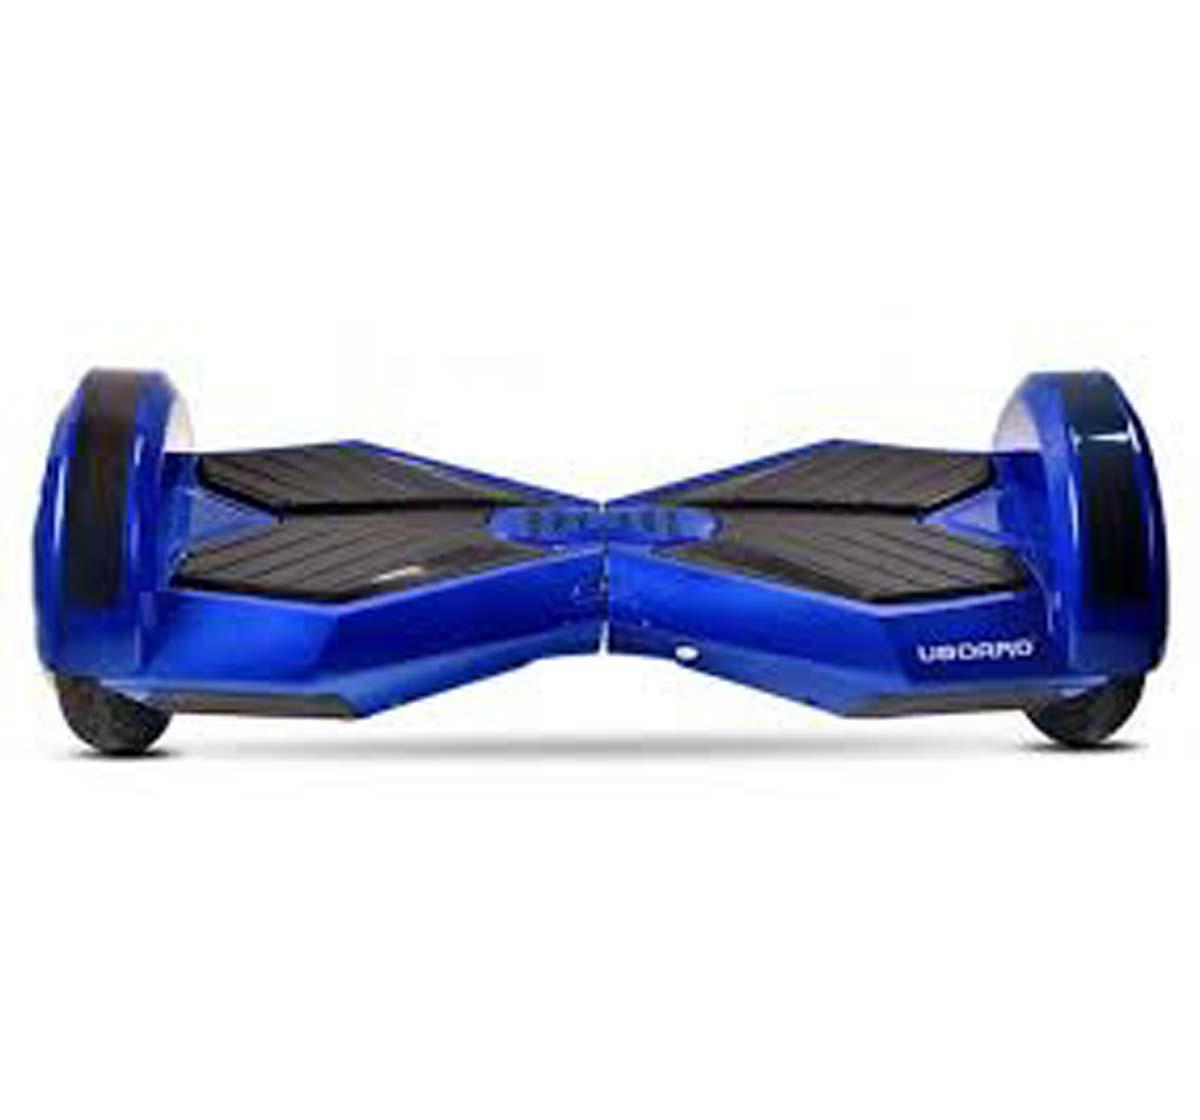 Uboard   Uboard Hoverboard Hybrid 6.5Inch Ev Novelty Rideons for Kids age 14Y+